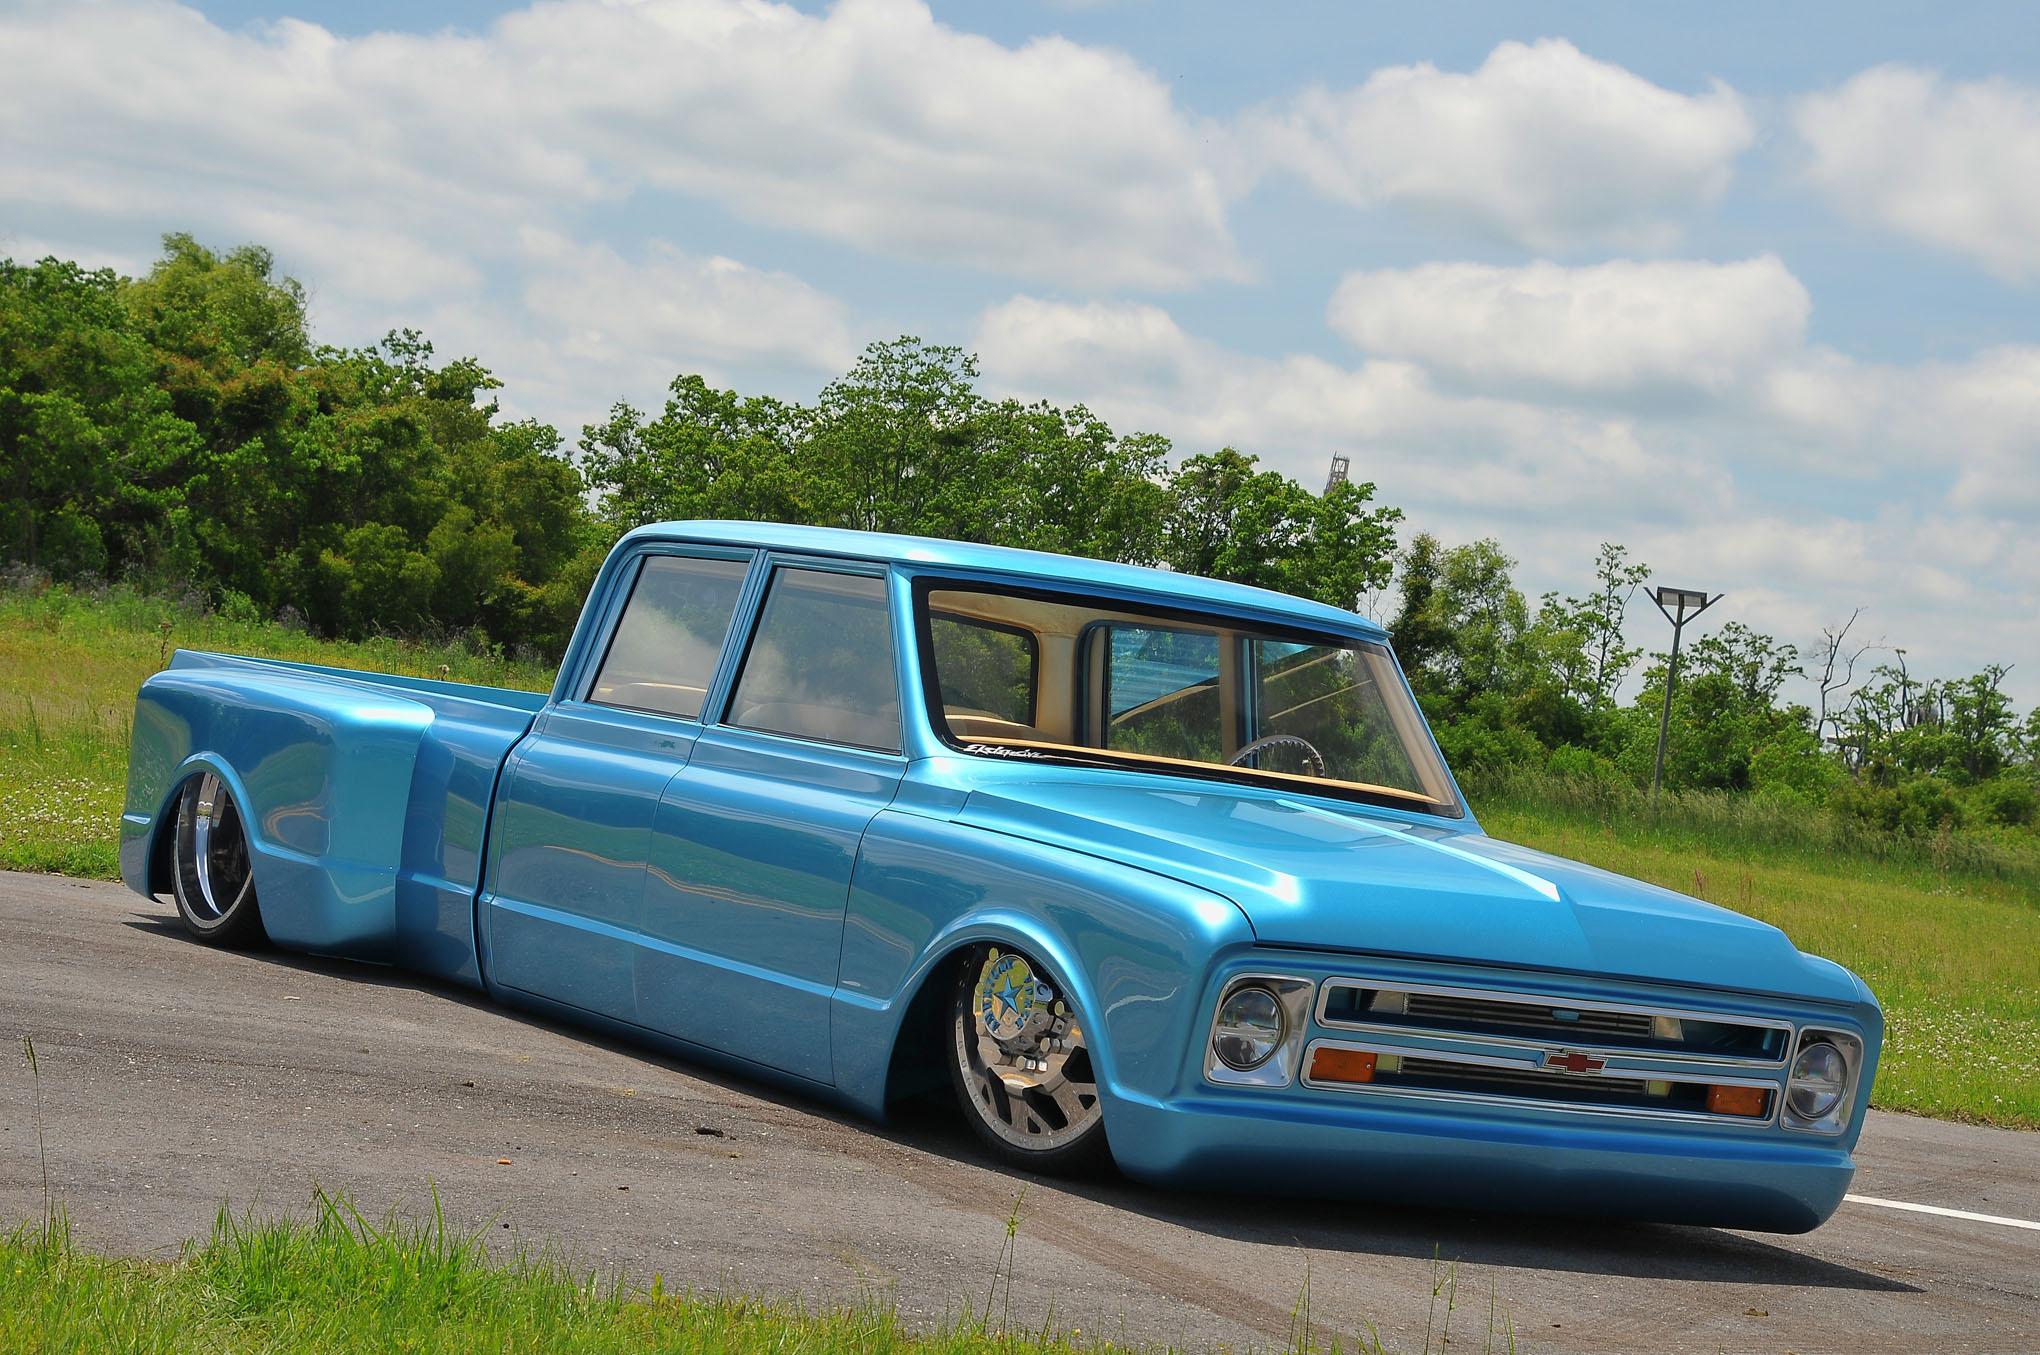 1970 Chevy Crew Cab Dualie La Perla Azul